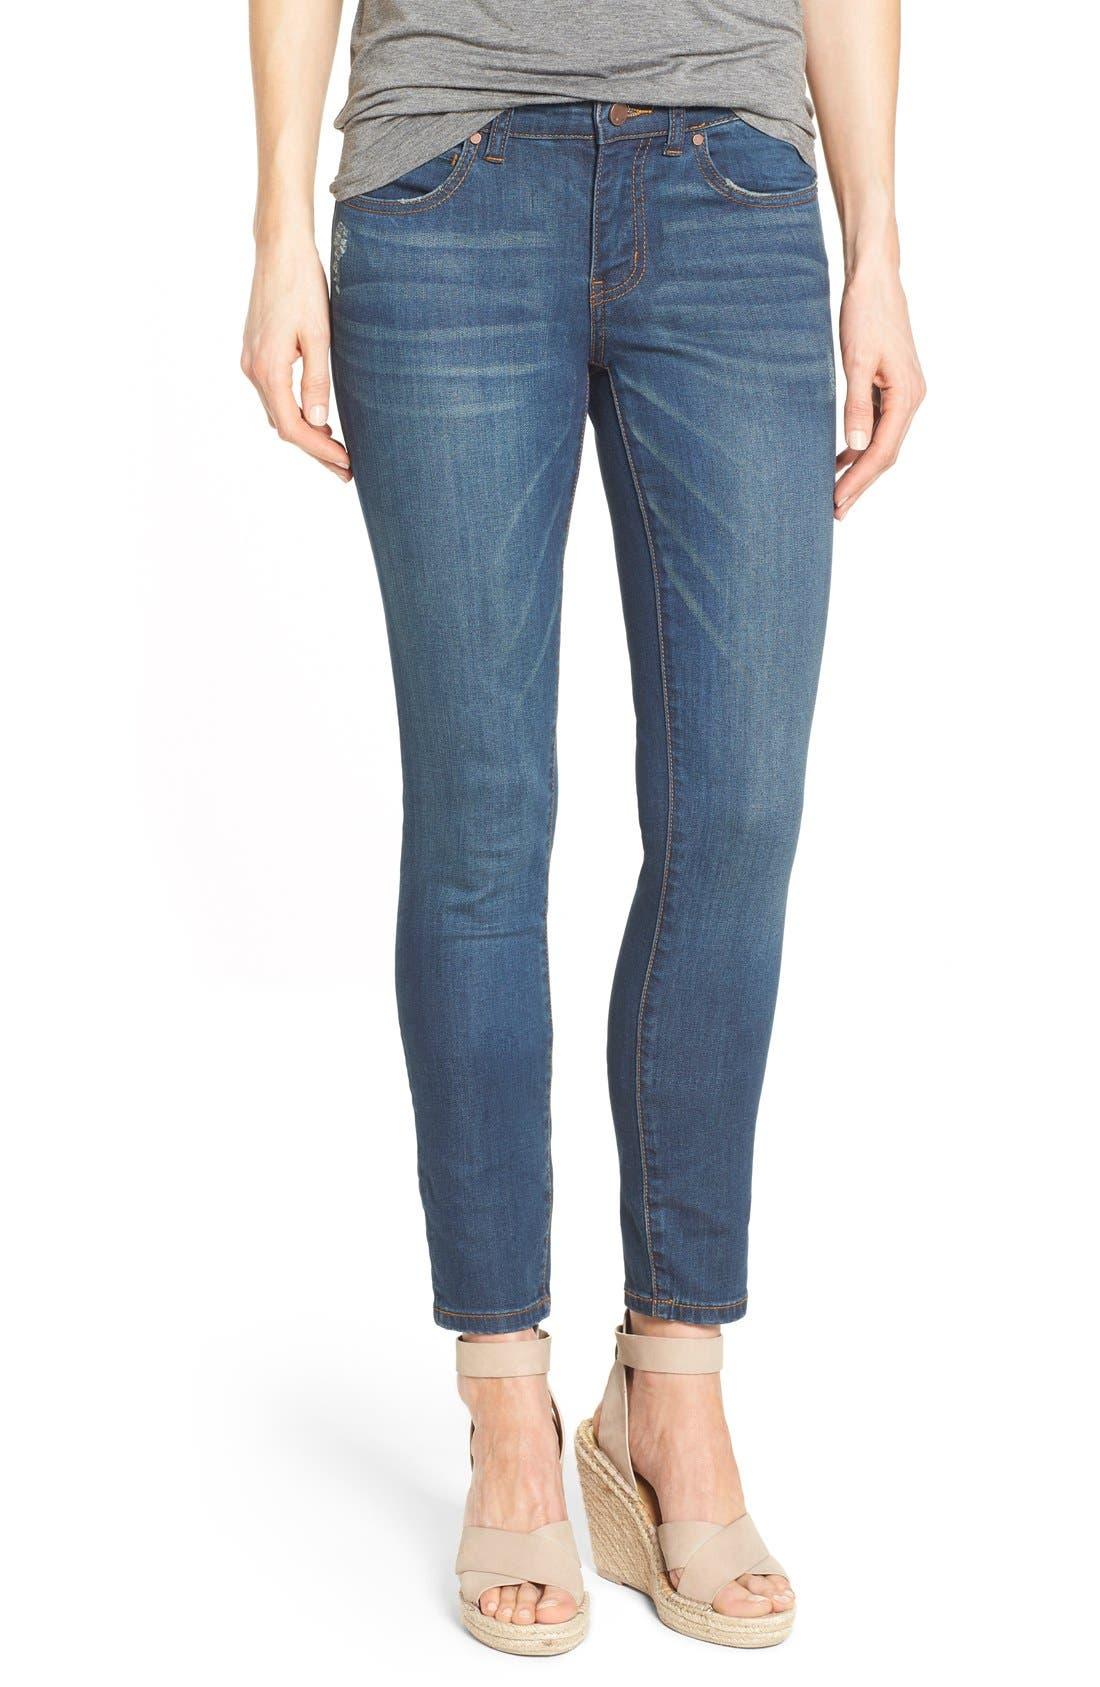 Alternate Image 1 Selected - Caslon® Stretch Skinny Ankle Jeans (Midnight) (Regular & Petite)